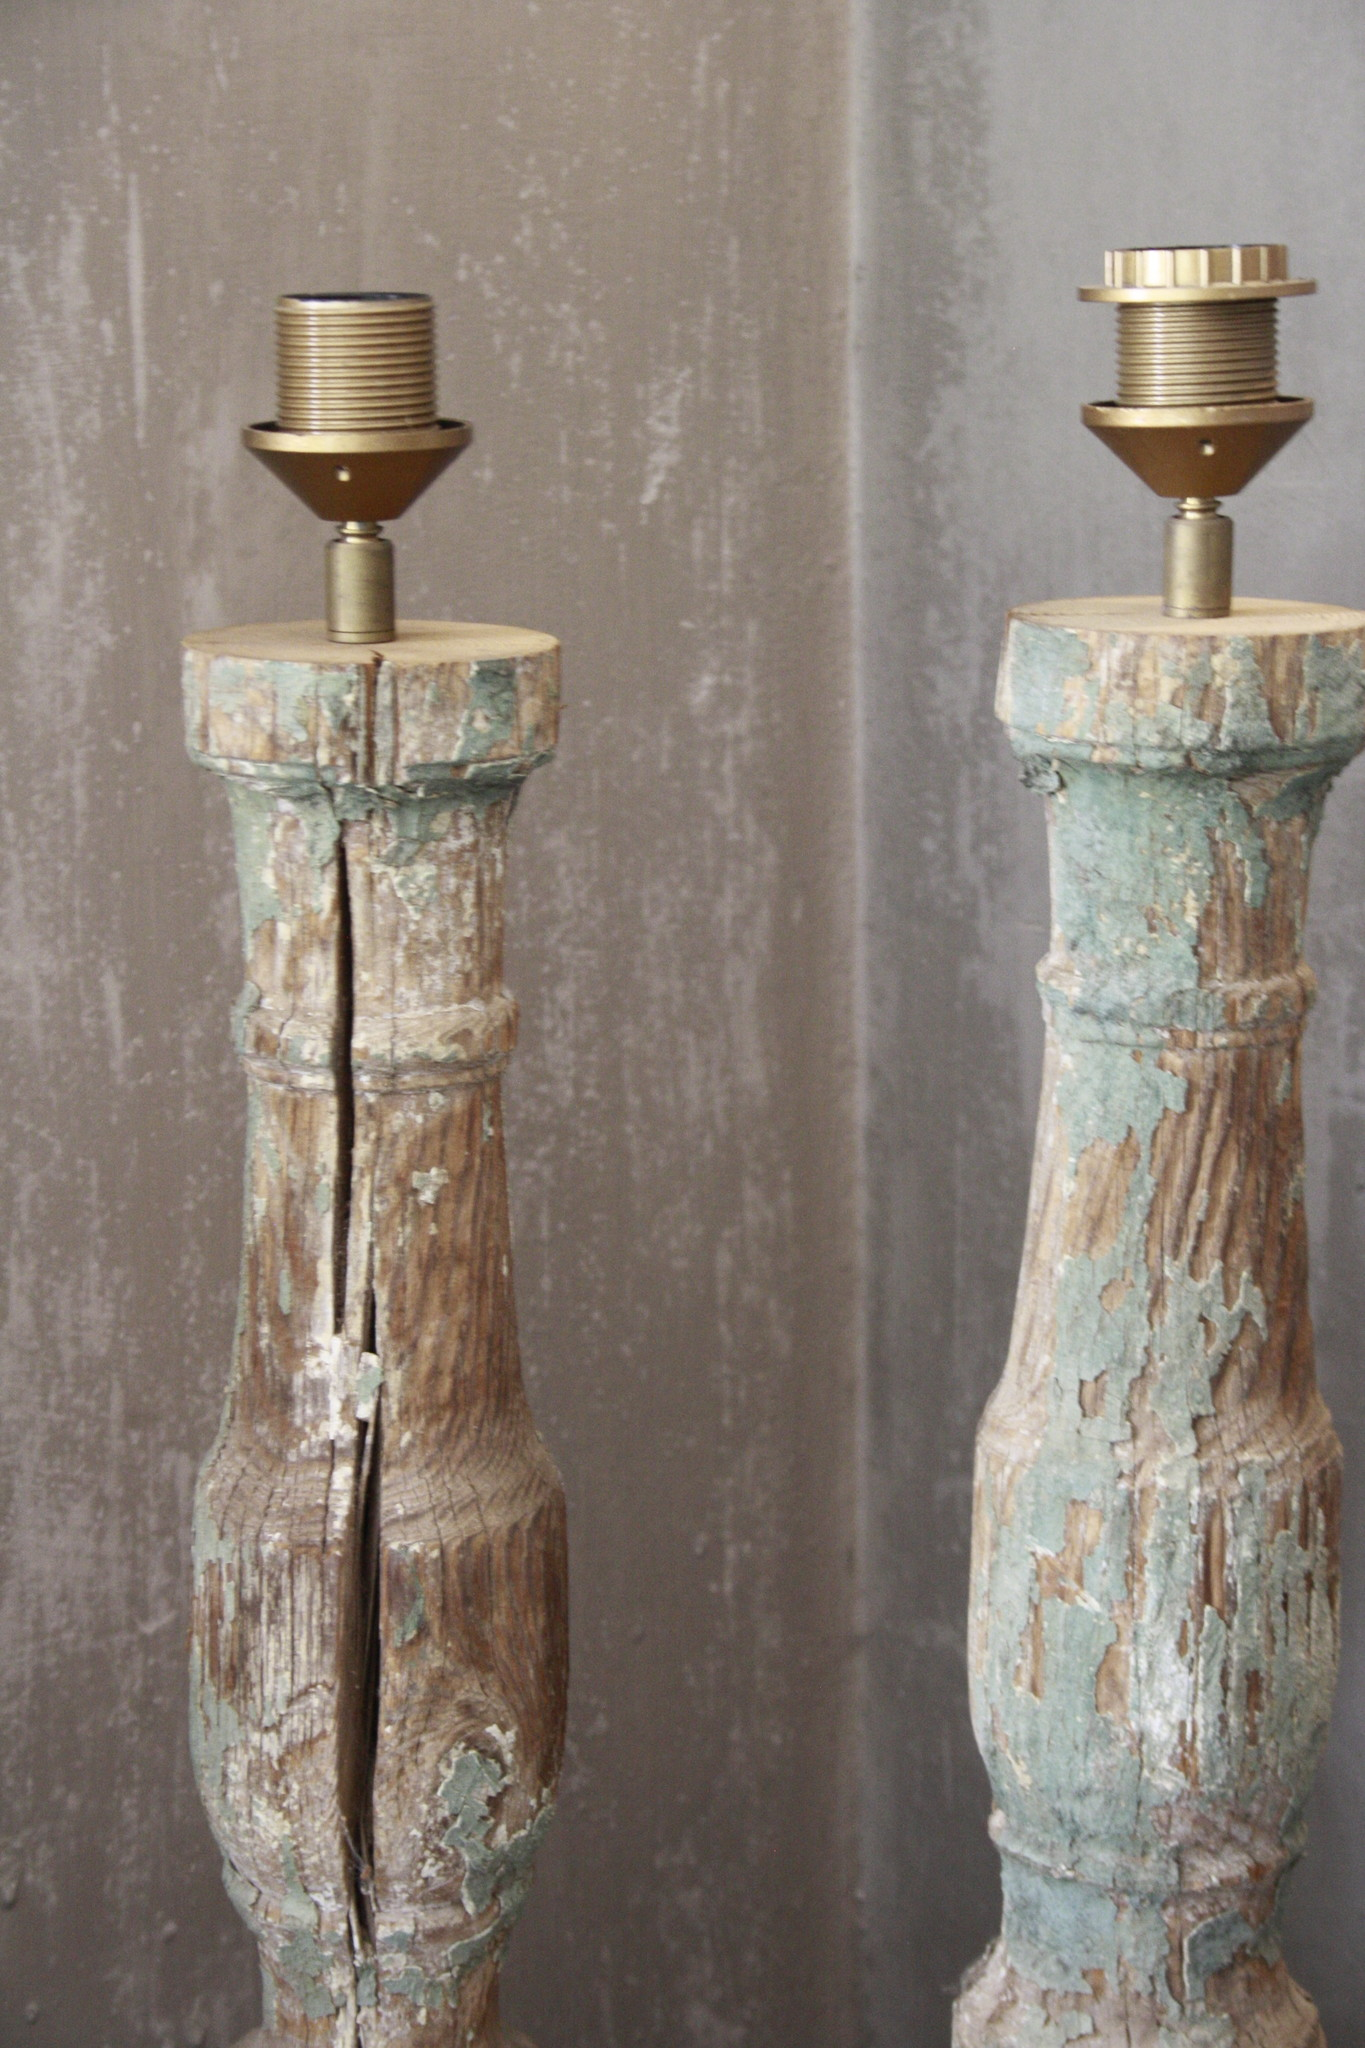 SET 2x Balusterlamp Oud Hout Groen tint 60 cm-3